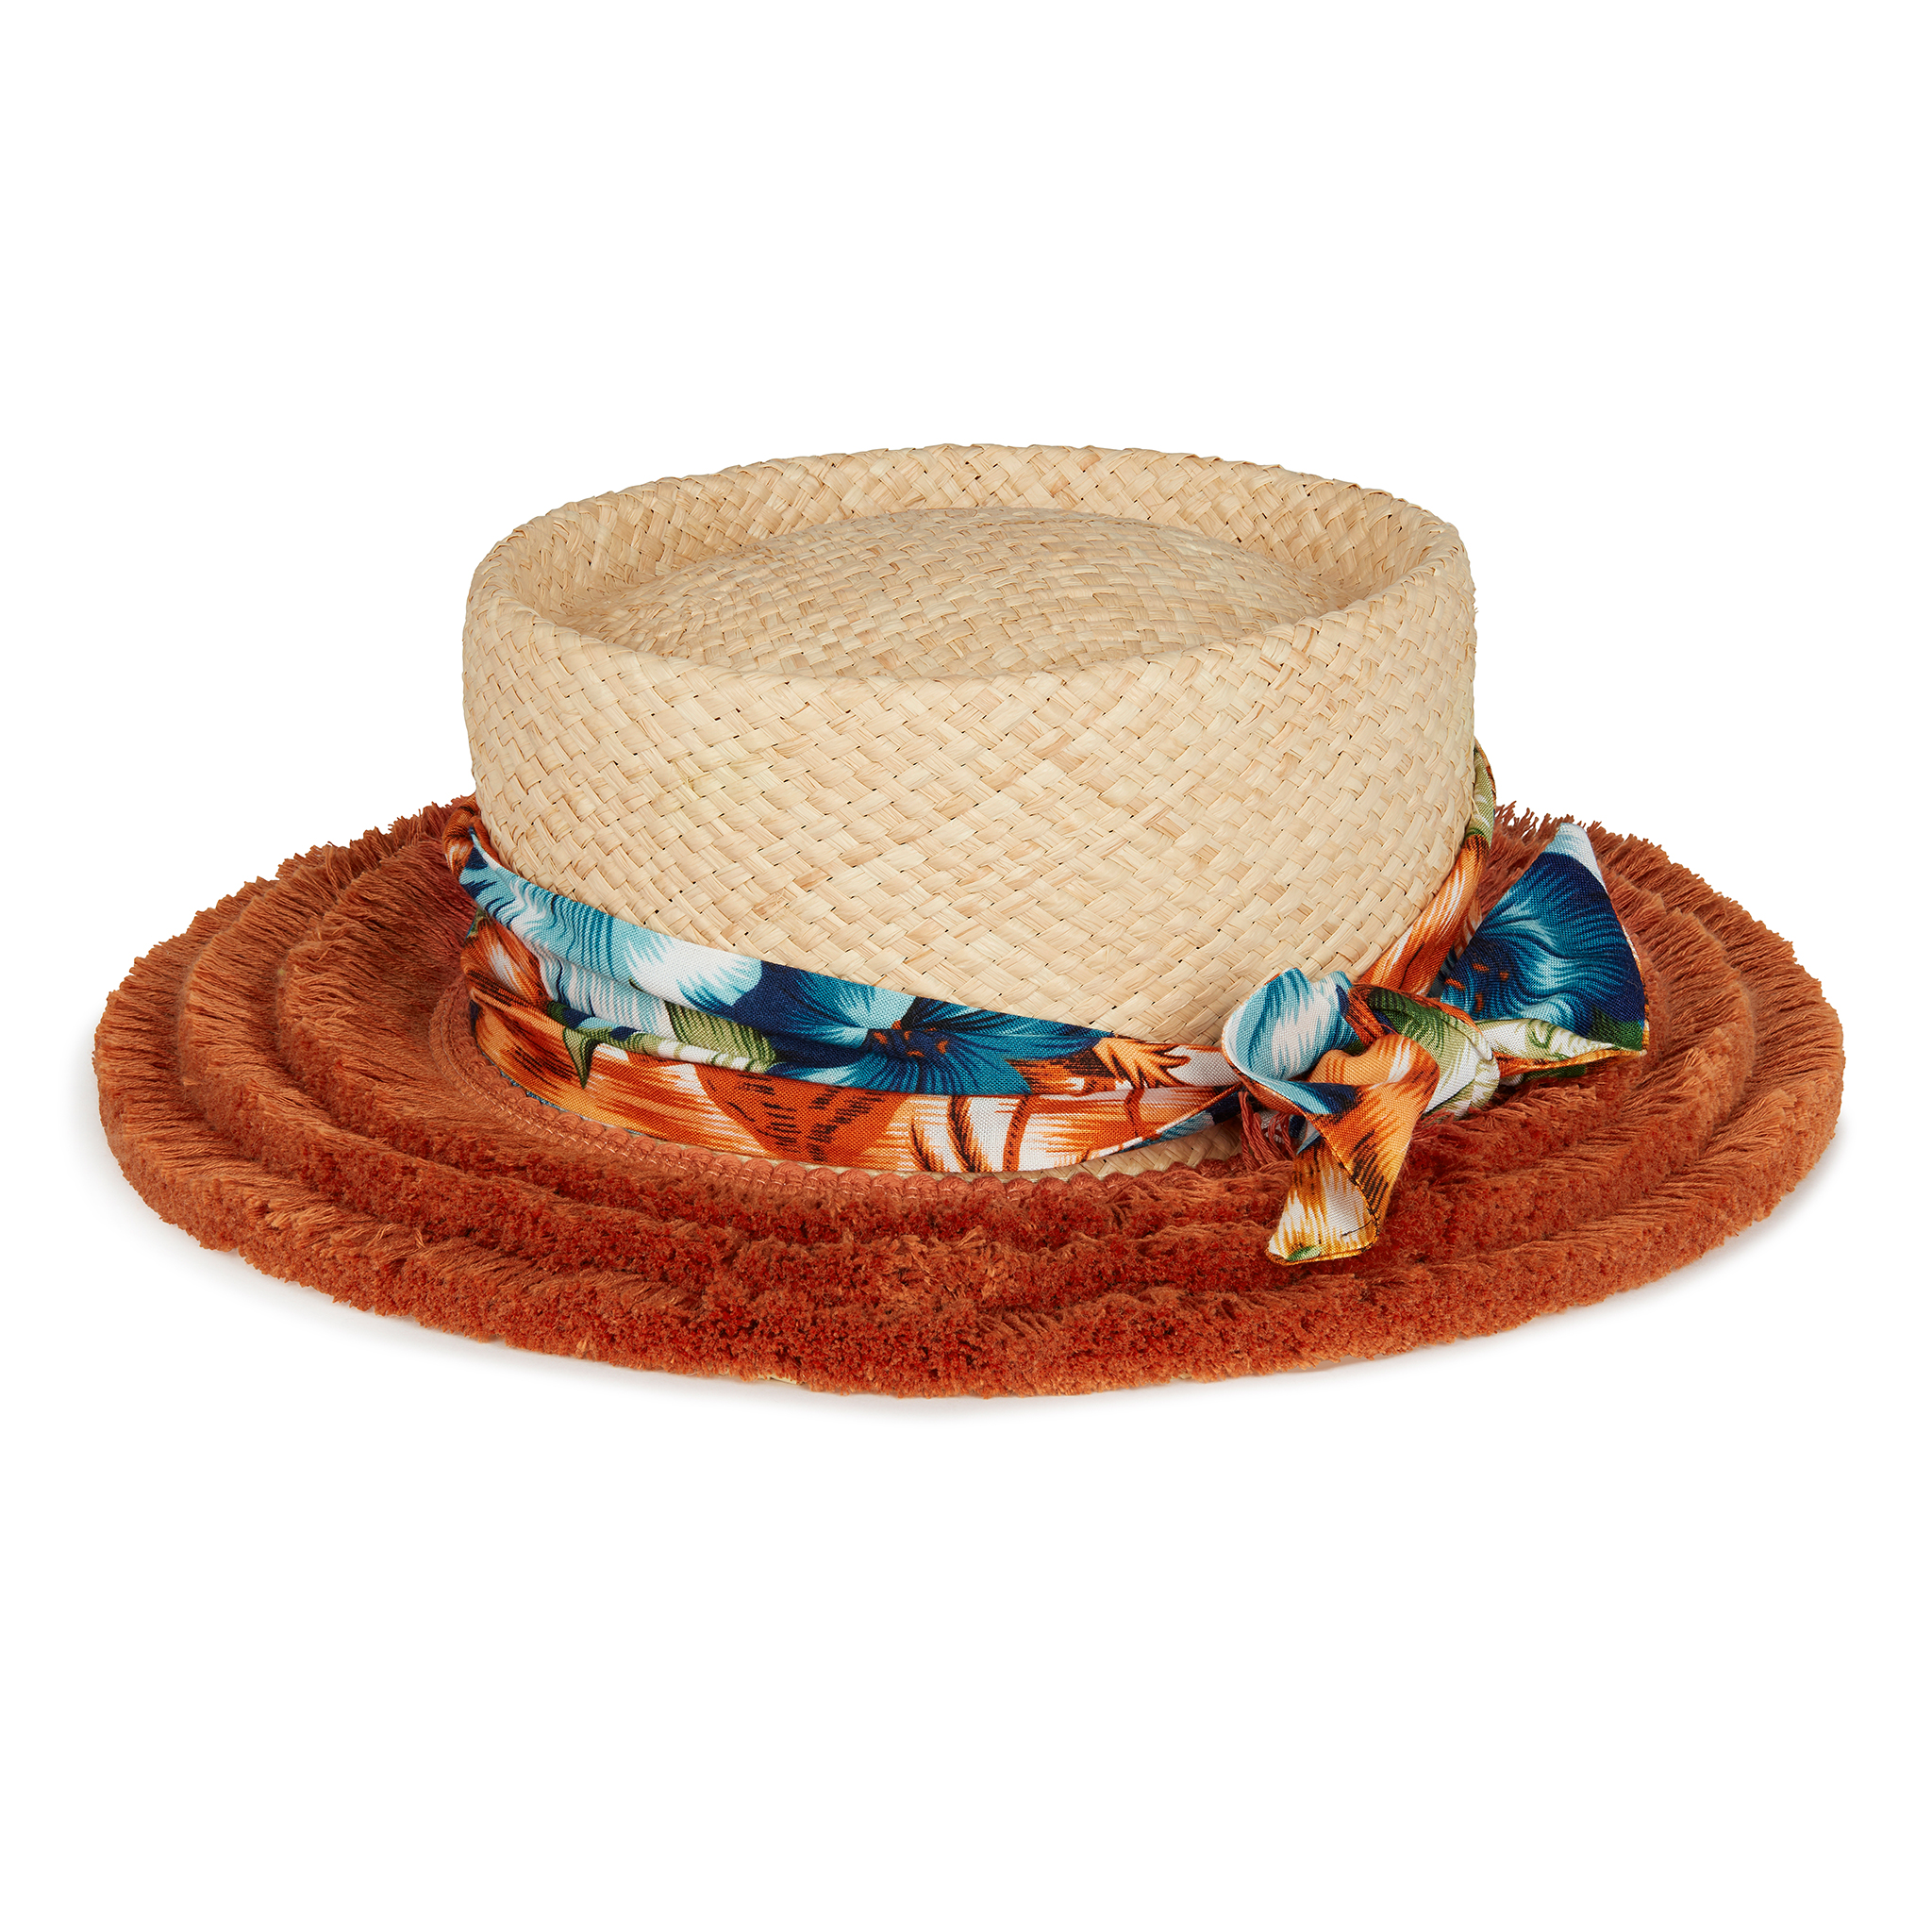 LRP-SM-Benoit-hats_06.jpg